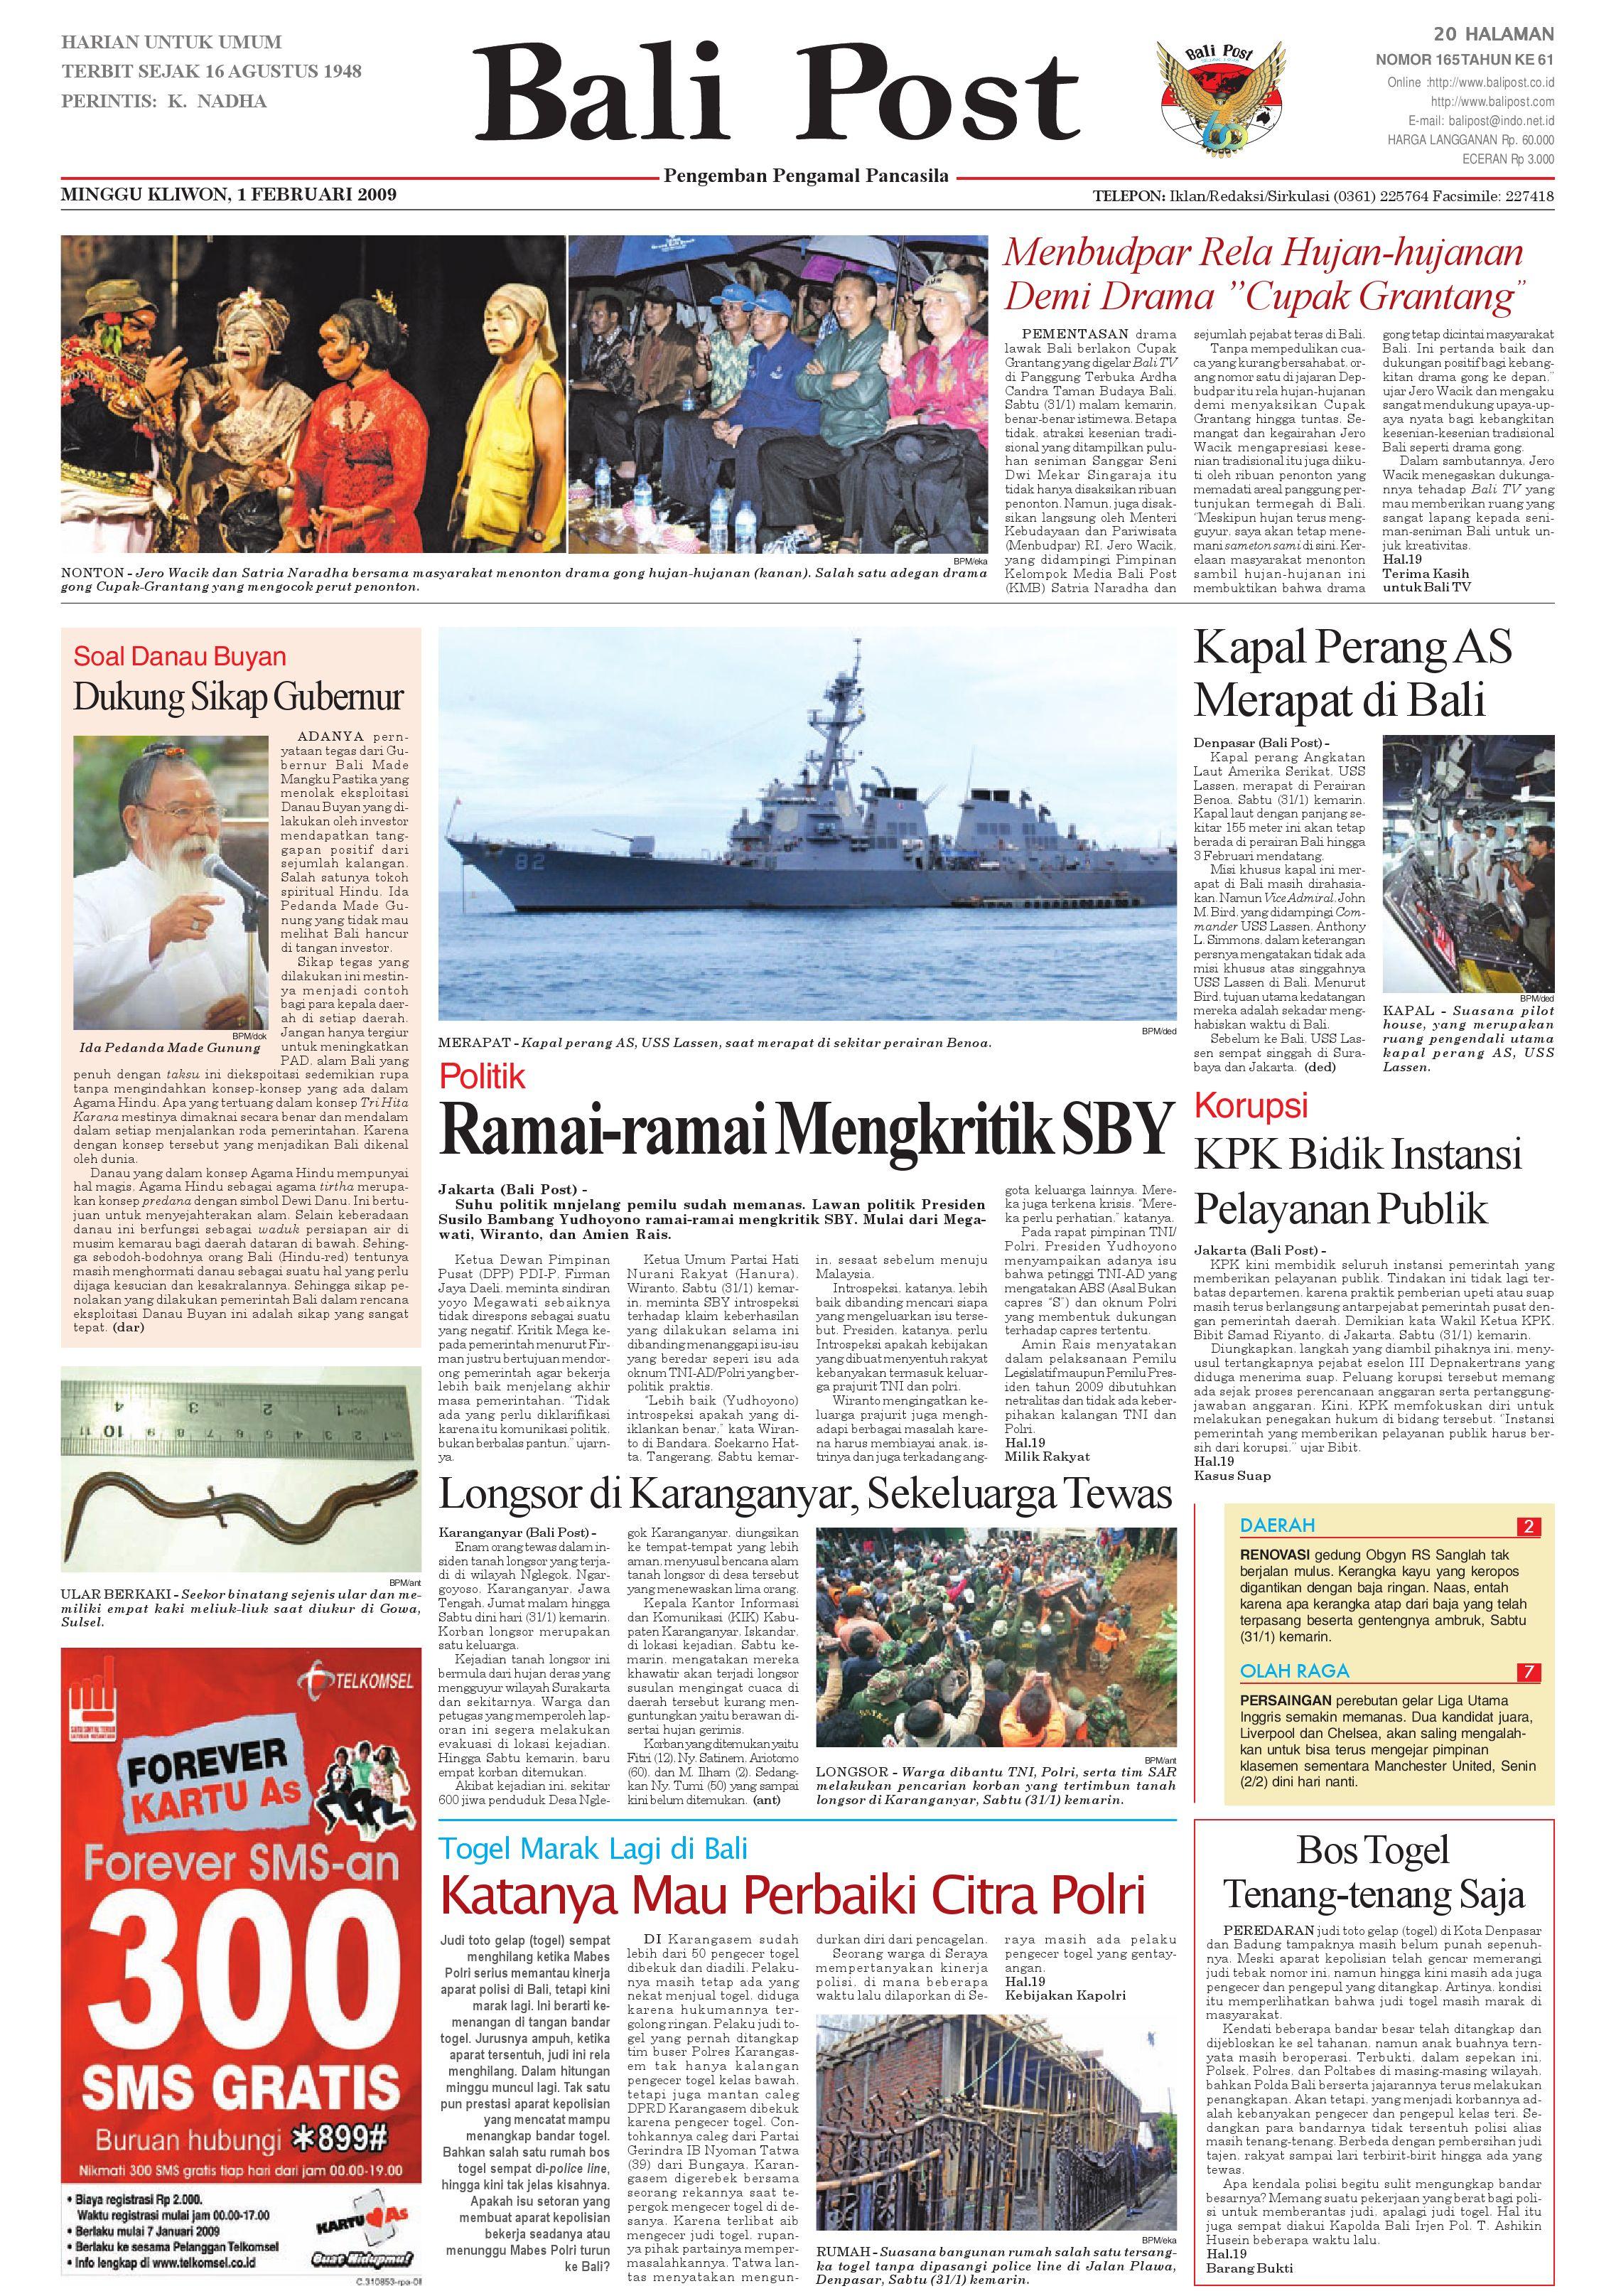 Bali Post Minggu 1 Februari 2009 By E Paper Kmb Issuu Voucher 300 Plus Tiara Gatzu Monang Maning Toko Soputan